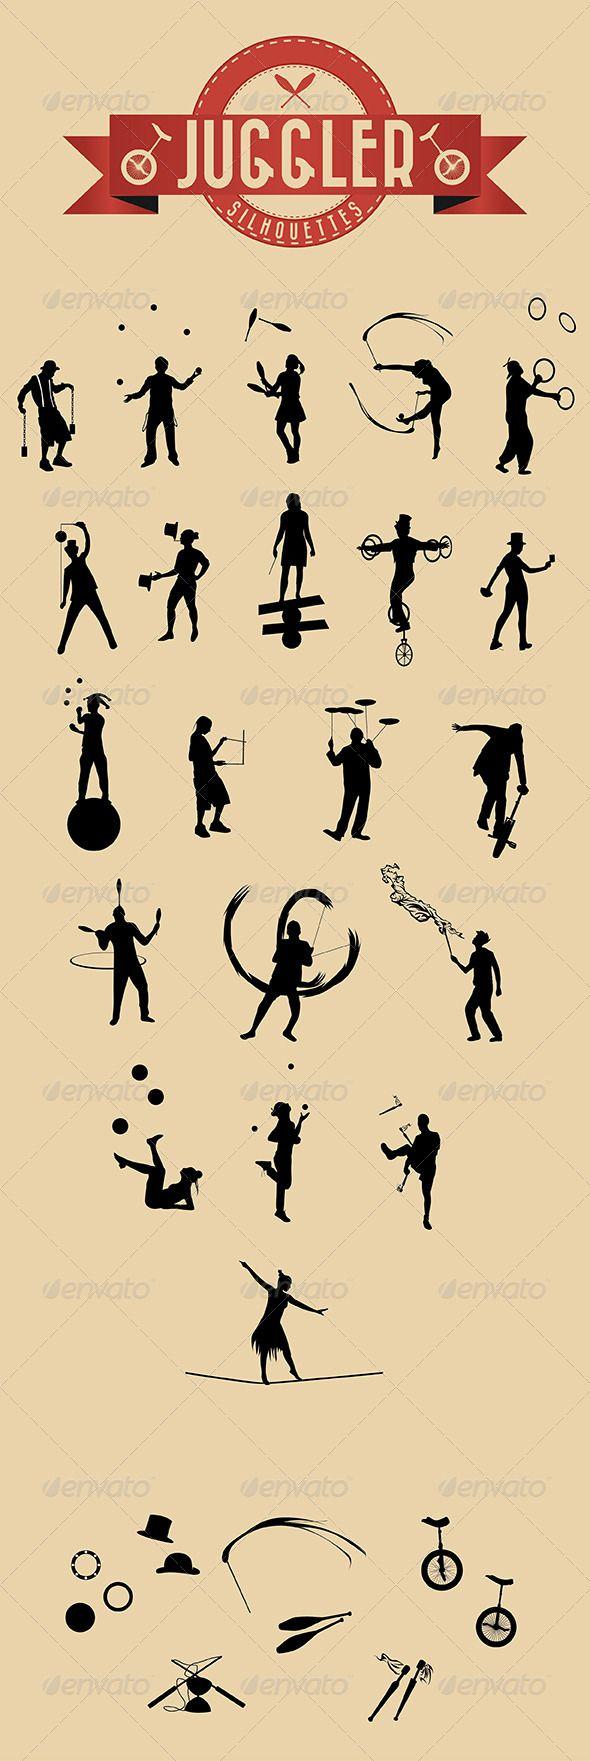 21 Jugglers Vector Silhouettes - Characters Vectors